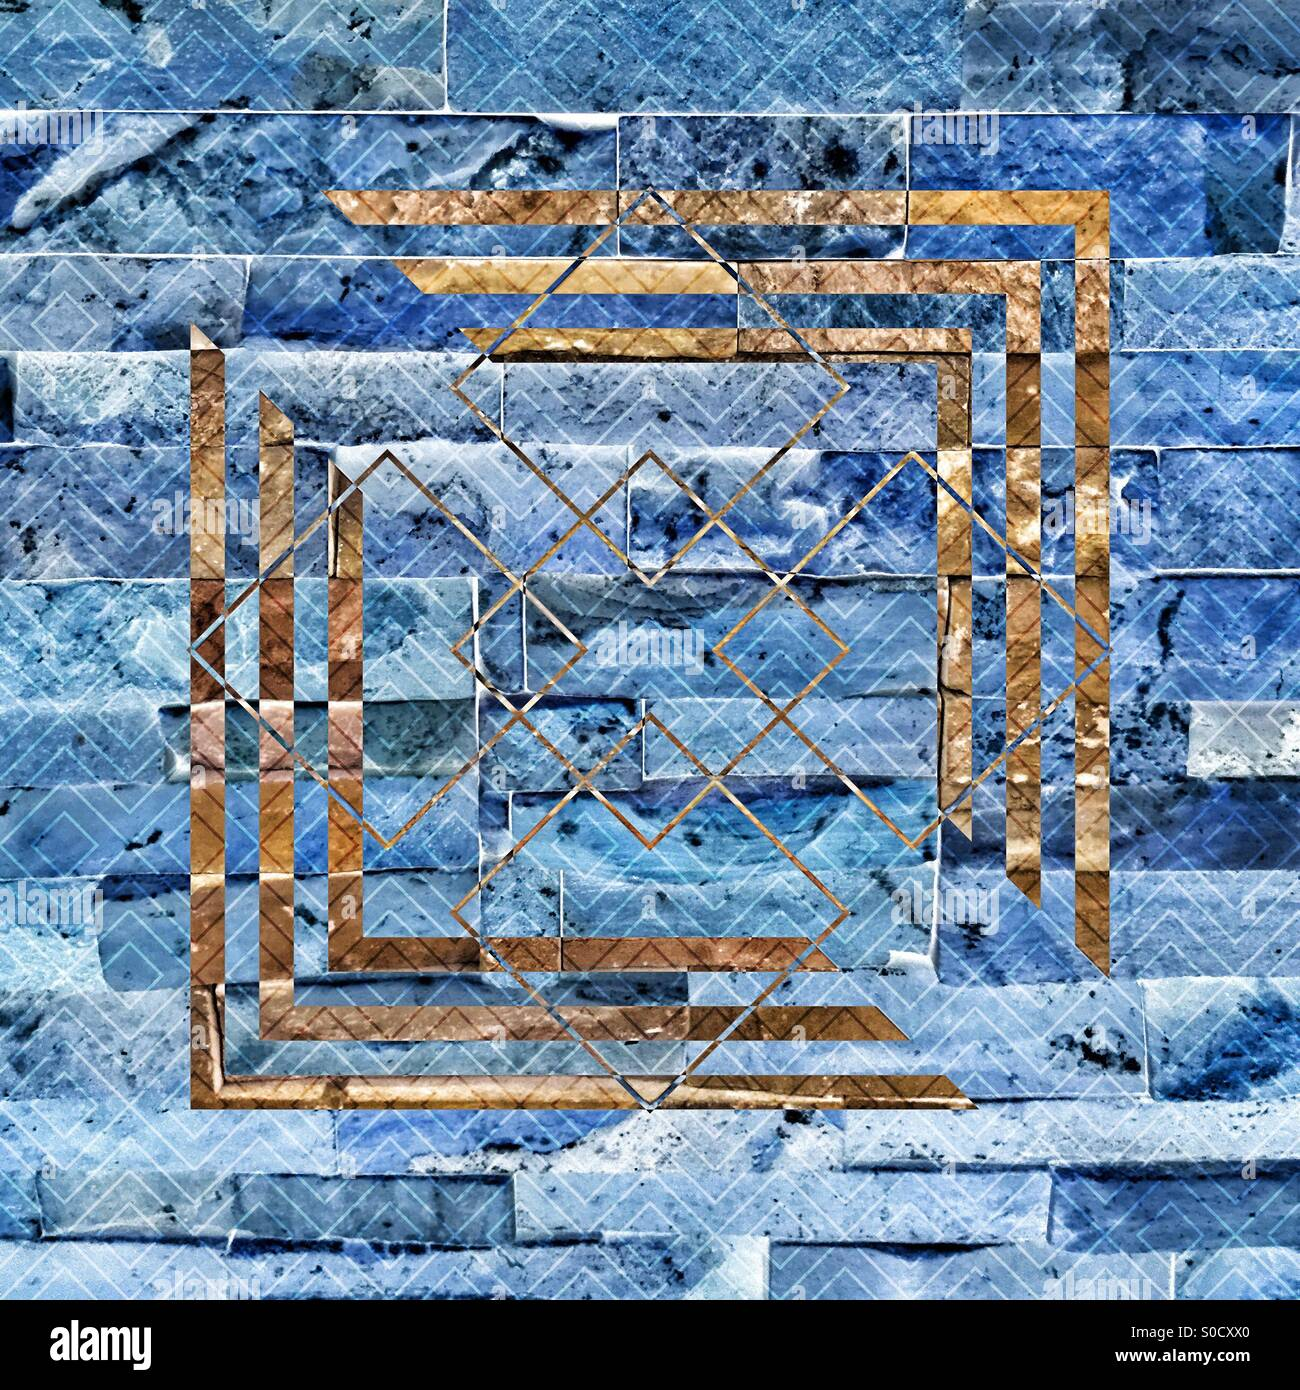 Blue-toned bricks with brown geometric pattern and diamond tangle overlay. - Stock Image